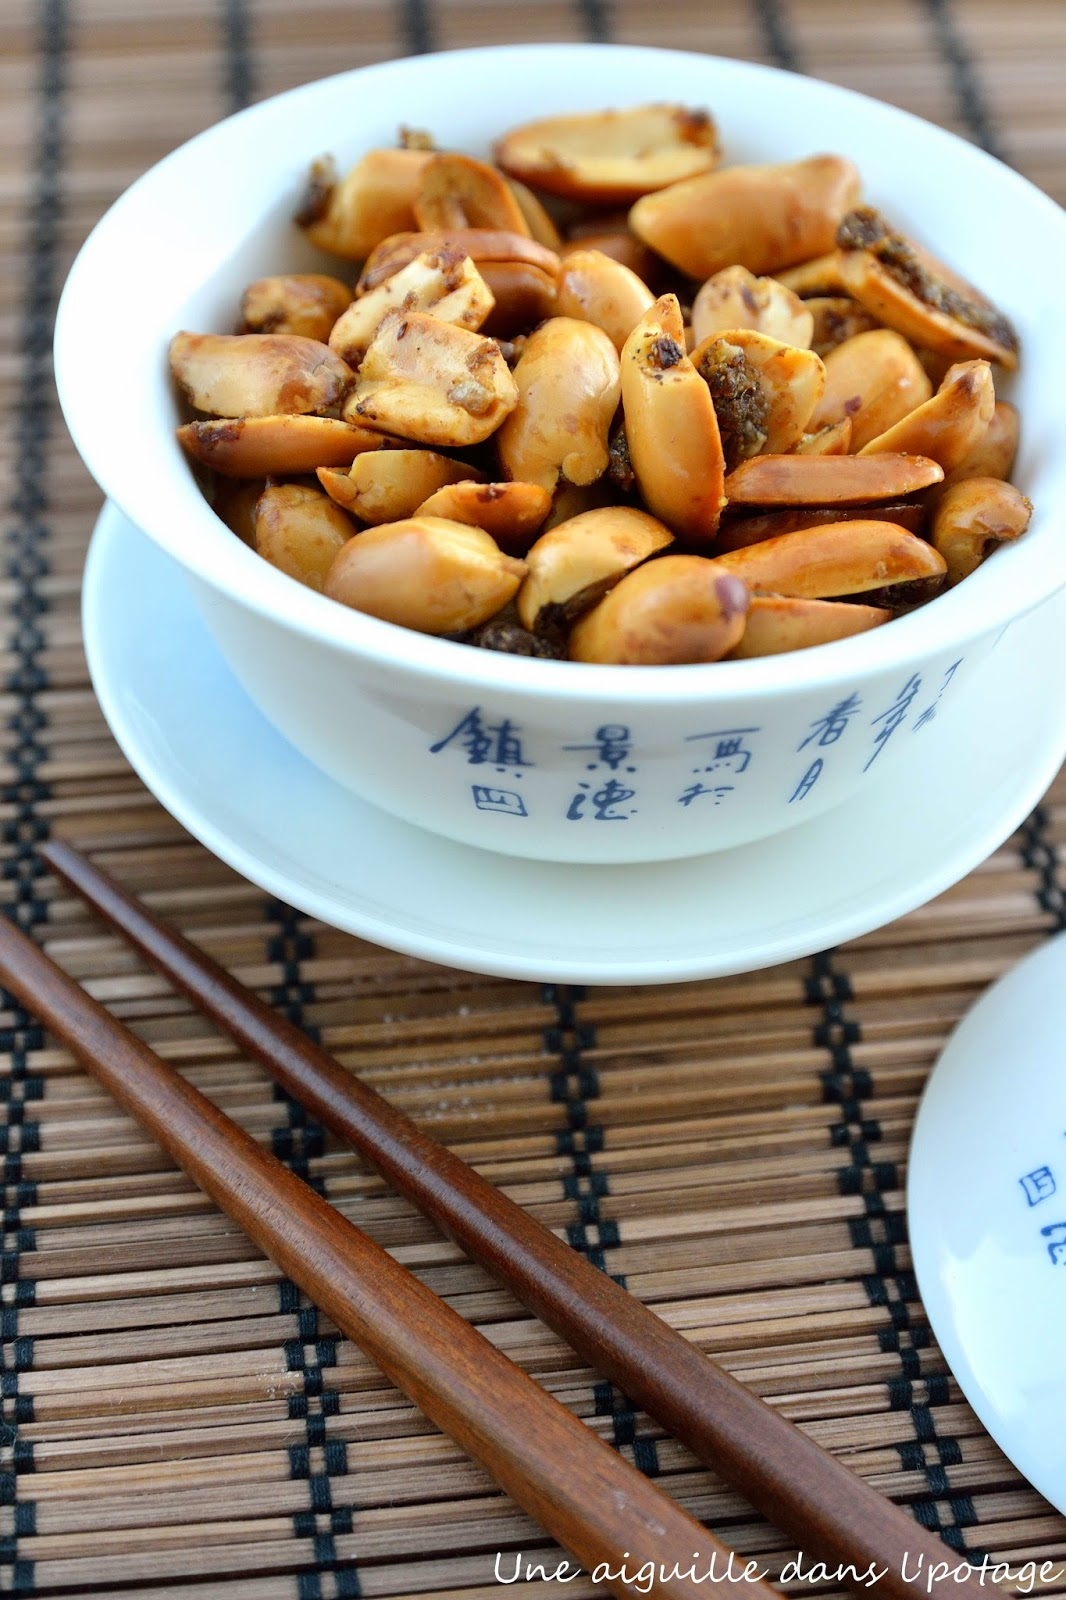 cuisine chinoise ken hom